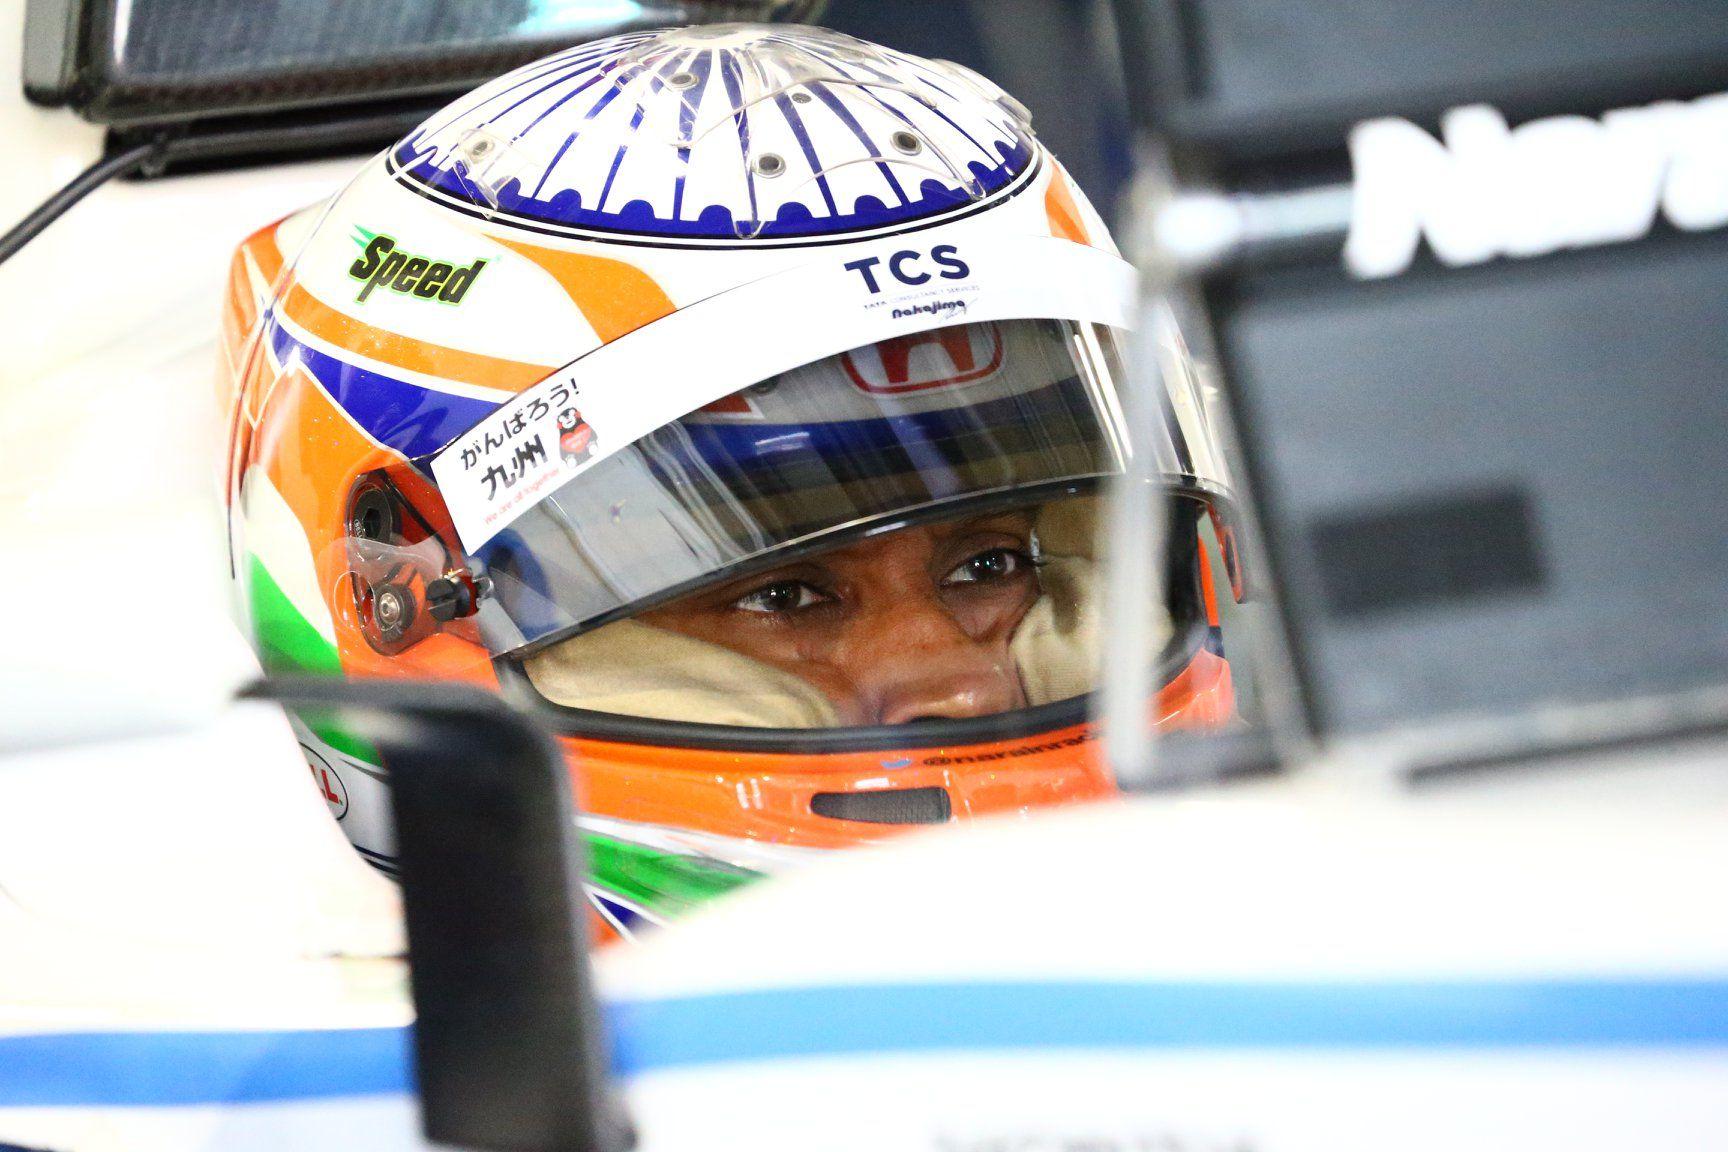 Narain Karthikeyan, Super GT